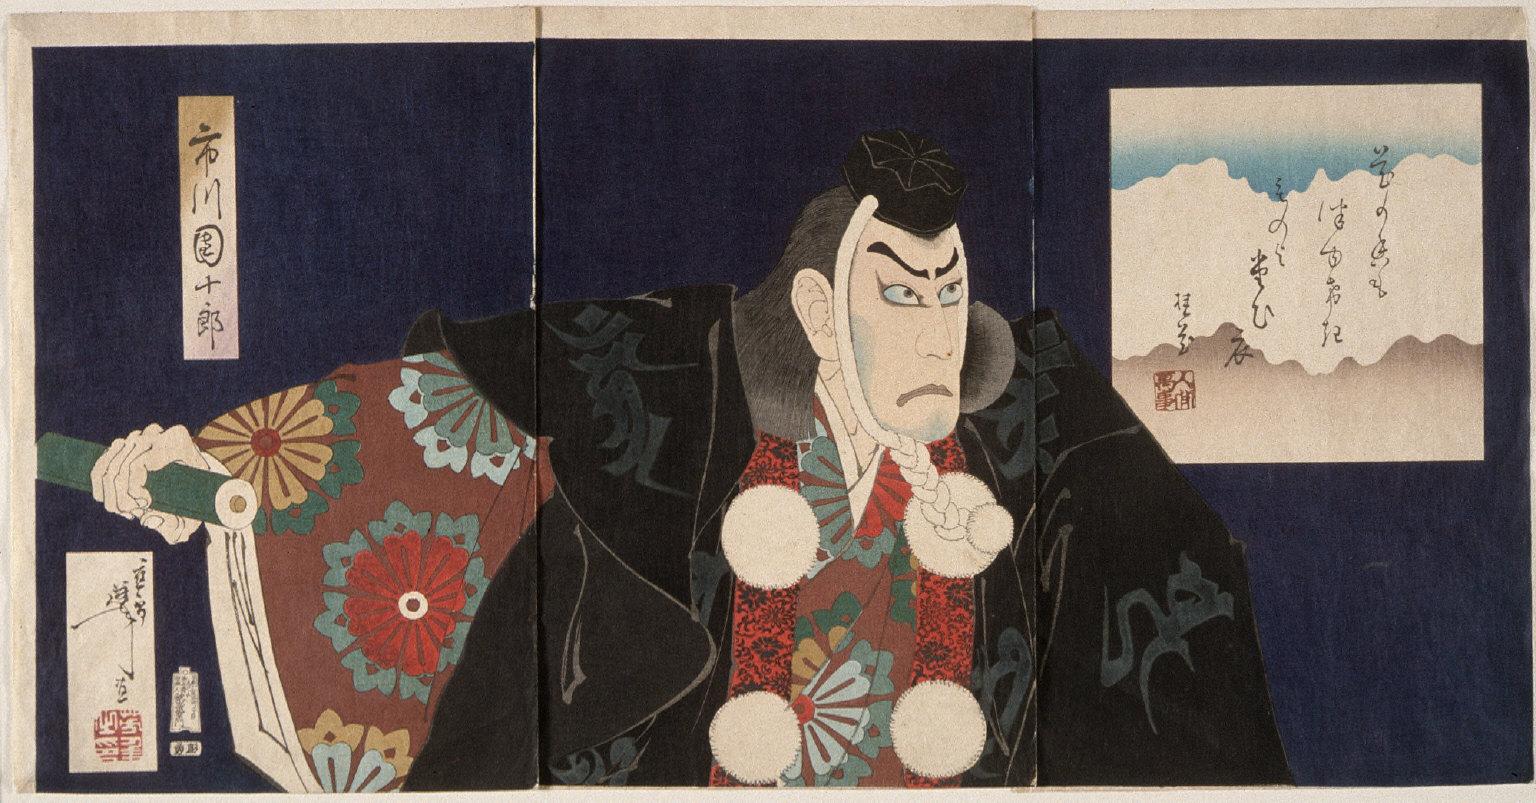 Ichikawa Danj?ur?o IX as Masashib?o Benkei in Kanjinch?o